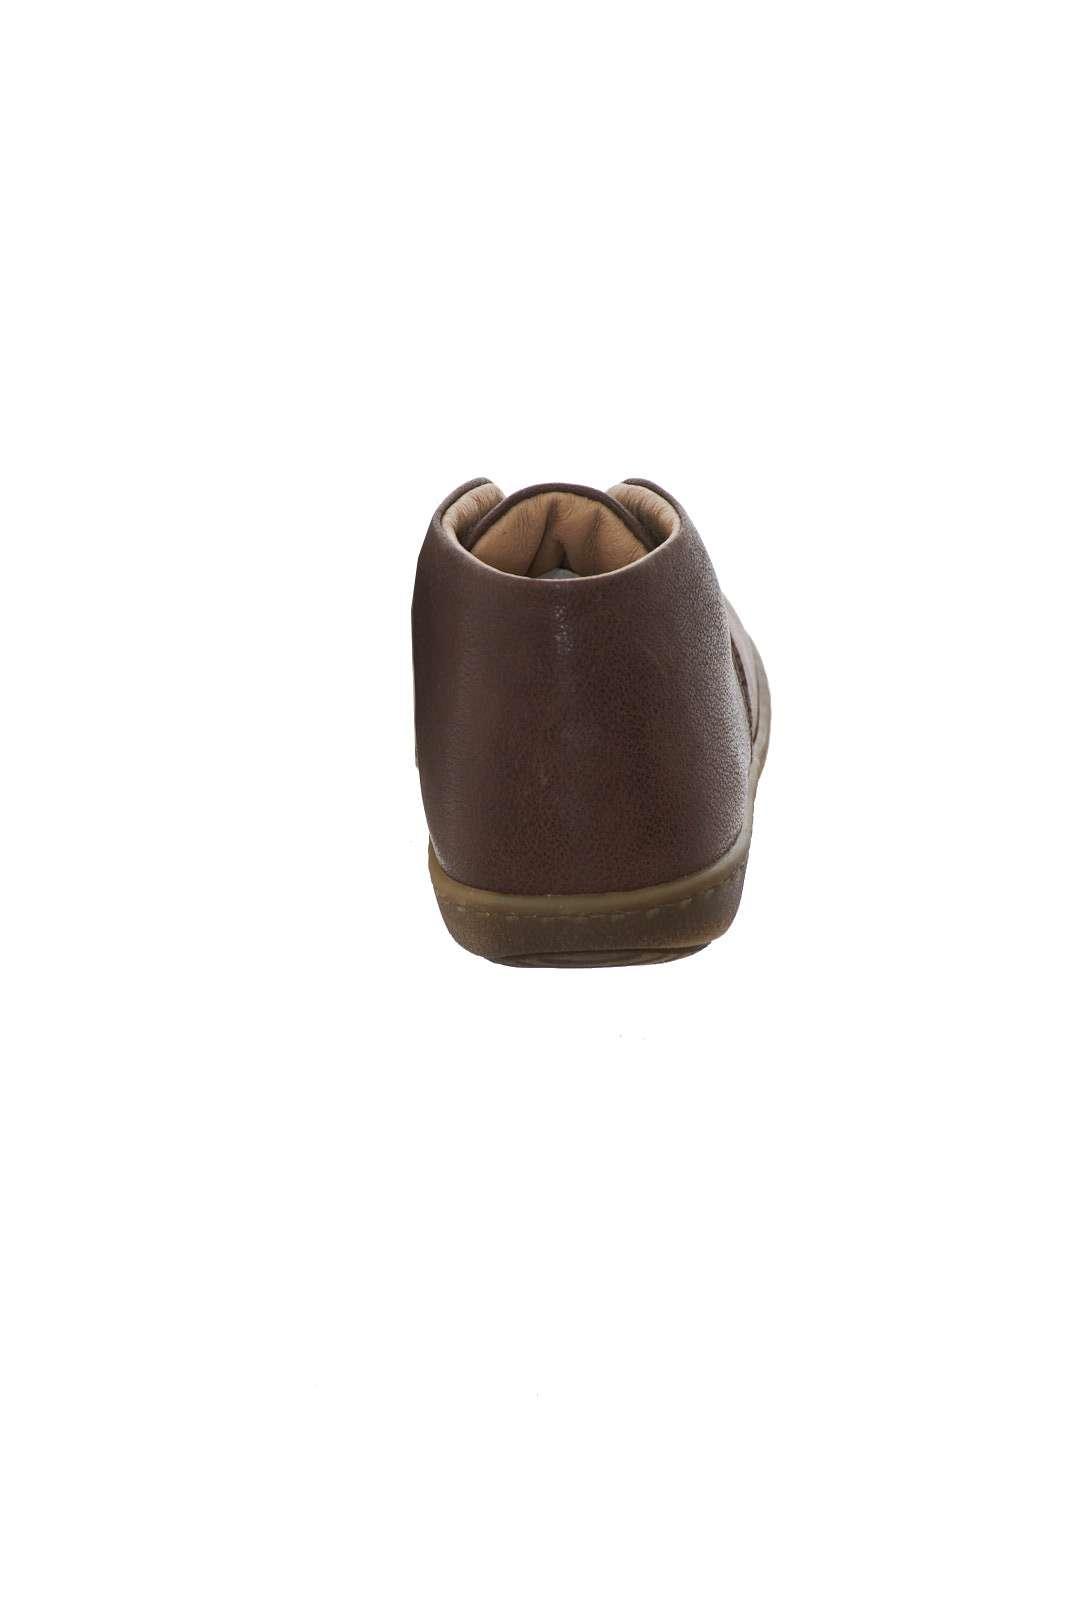 https://www.parmax.com/media/catalog/product/A/I/AI-outlet_parmax-scarpe-bambino-Gioiecologiche-3017-D.jpg